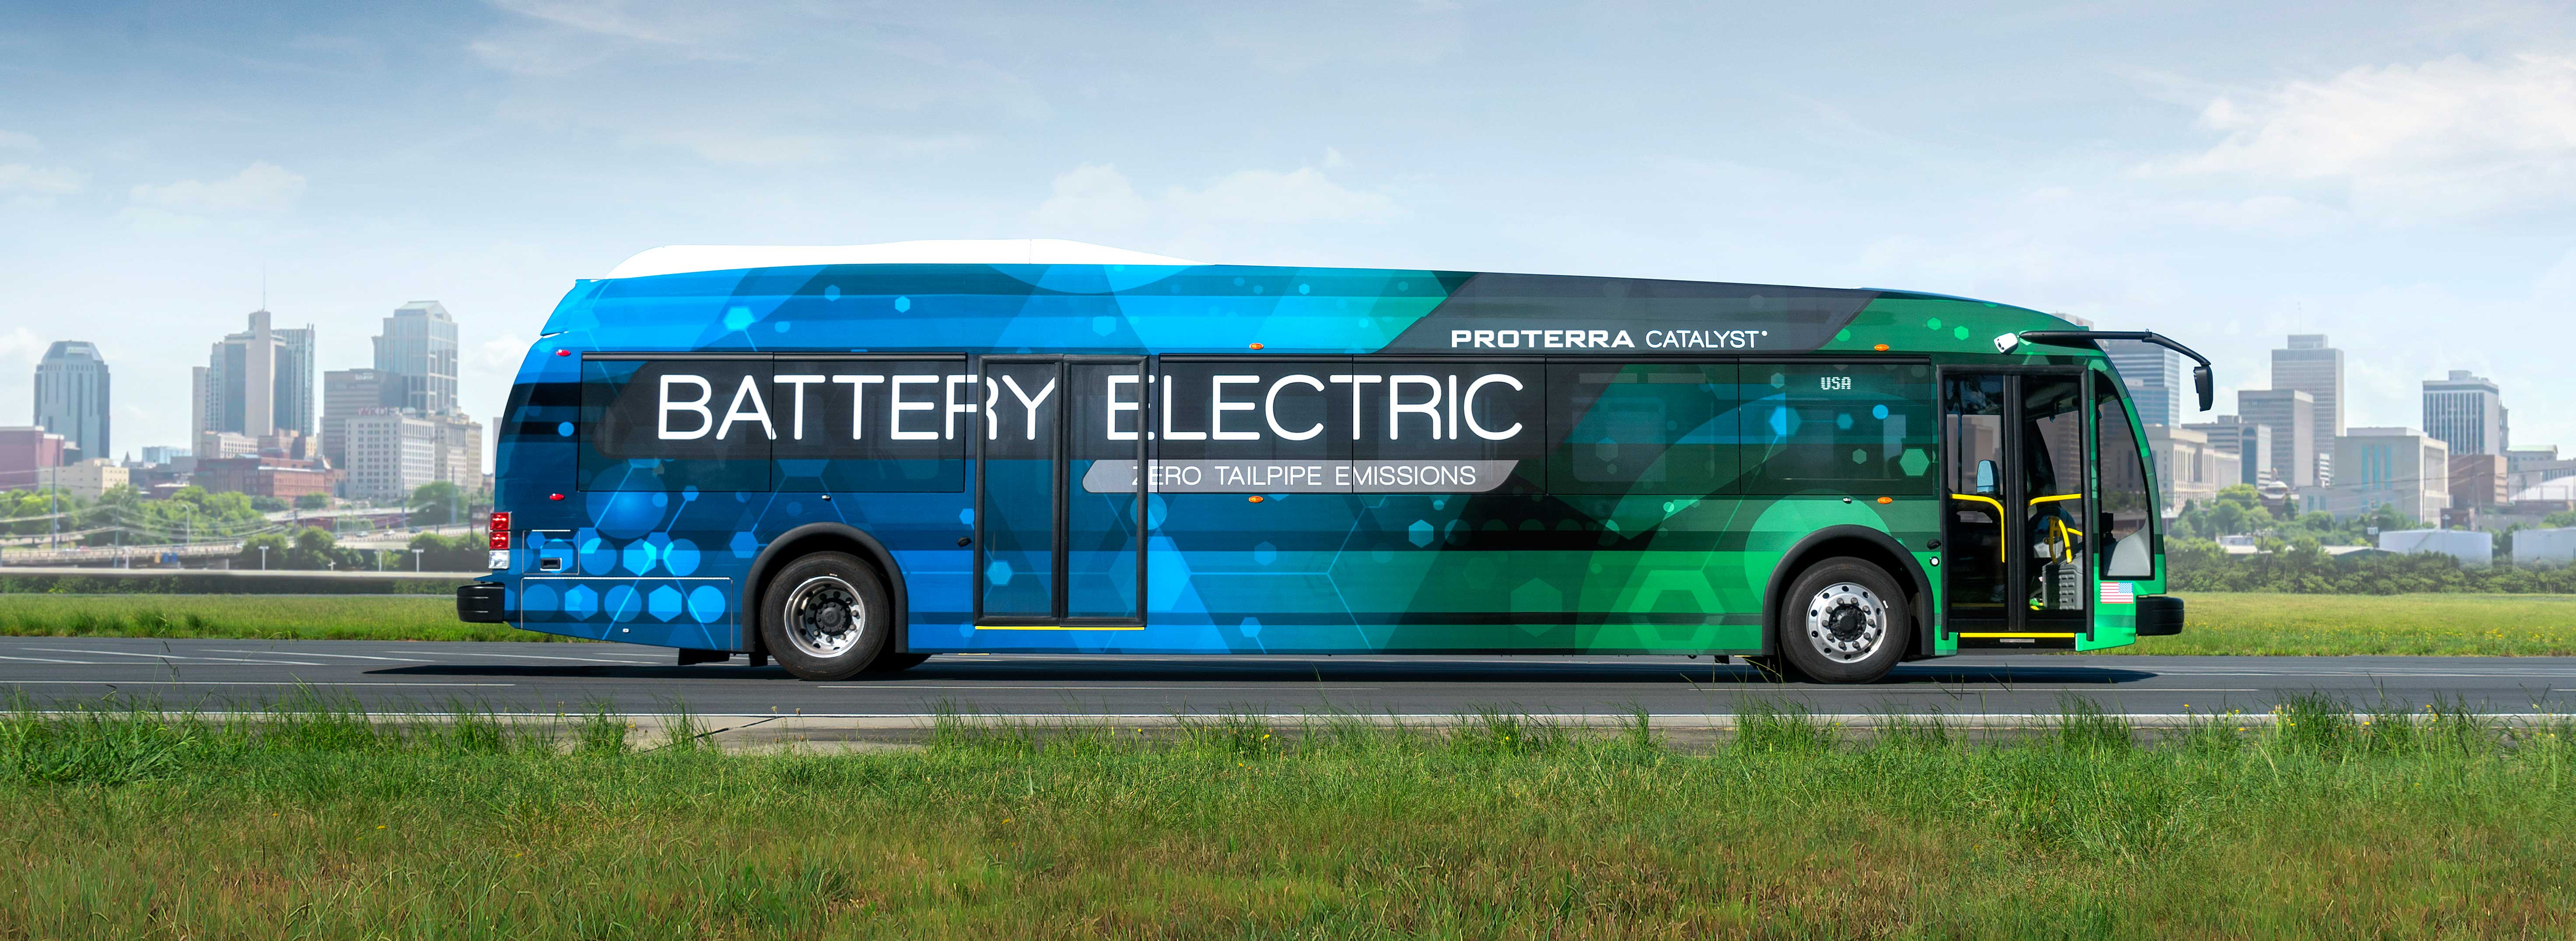 BGE Brings Baltimore City Electric Buses